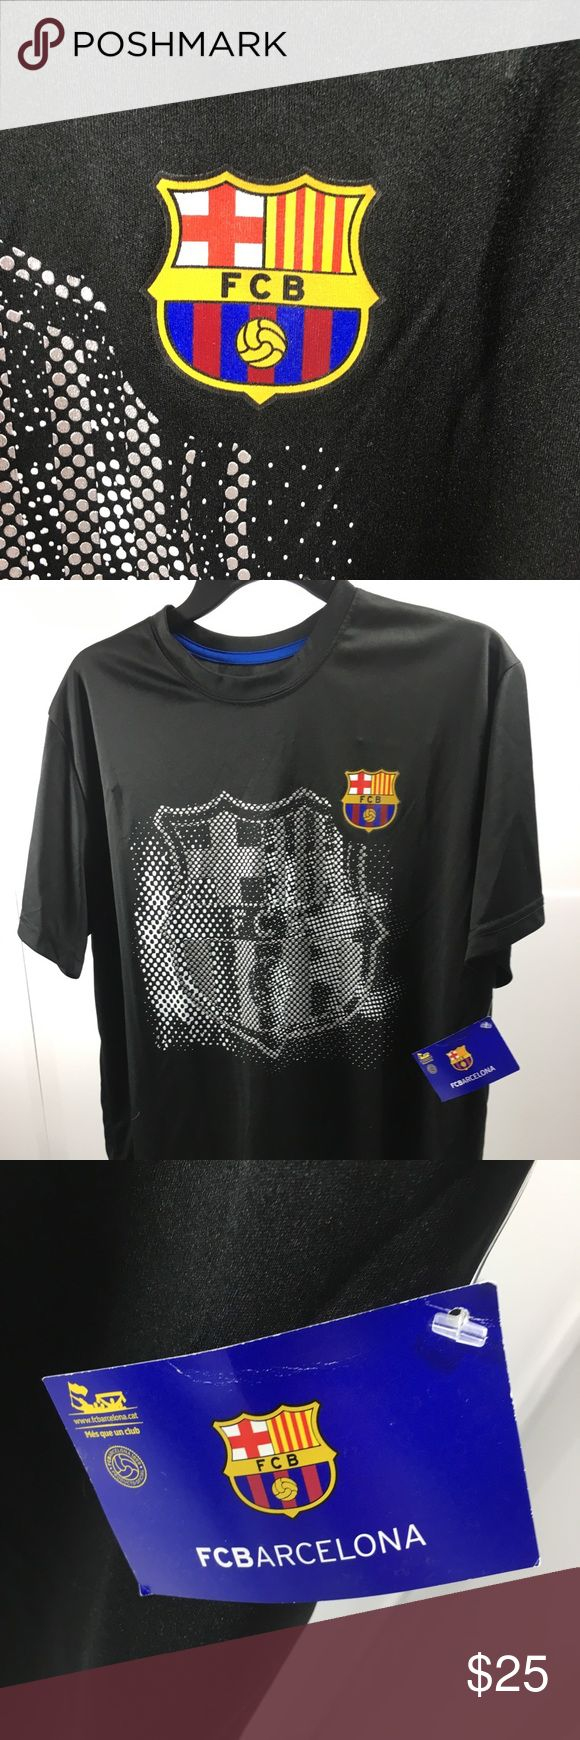 Men's shirt FCB BARCELONA LG POLY Mens T Shirt FCB BARCELONA LG PILY MIX BLACK Shirts Tees - Short Sleeve